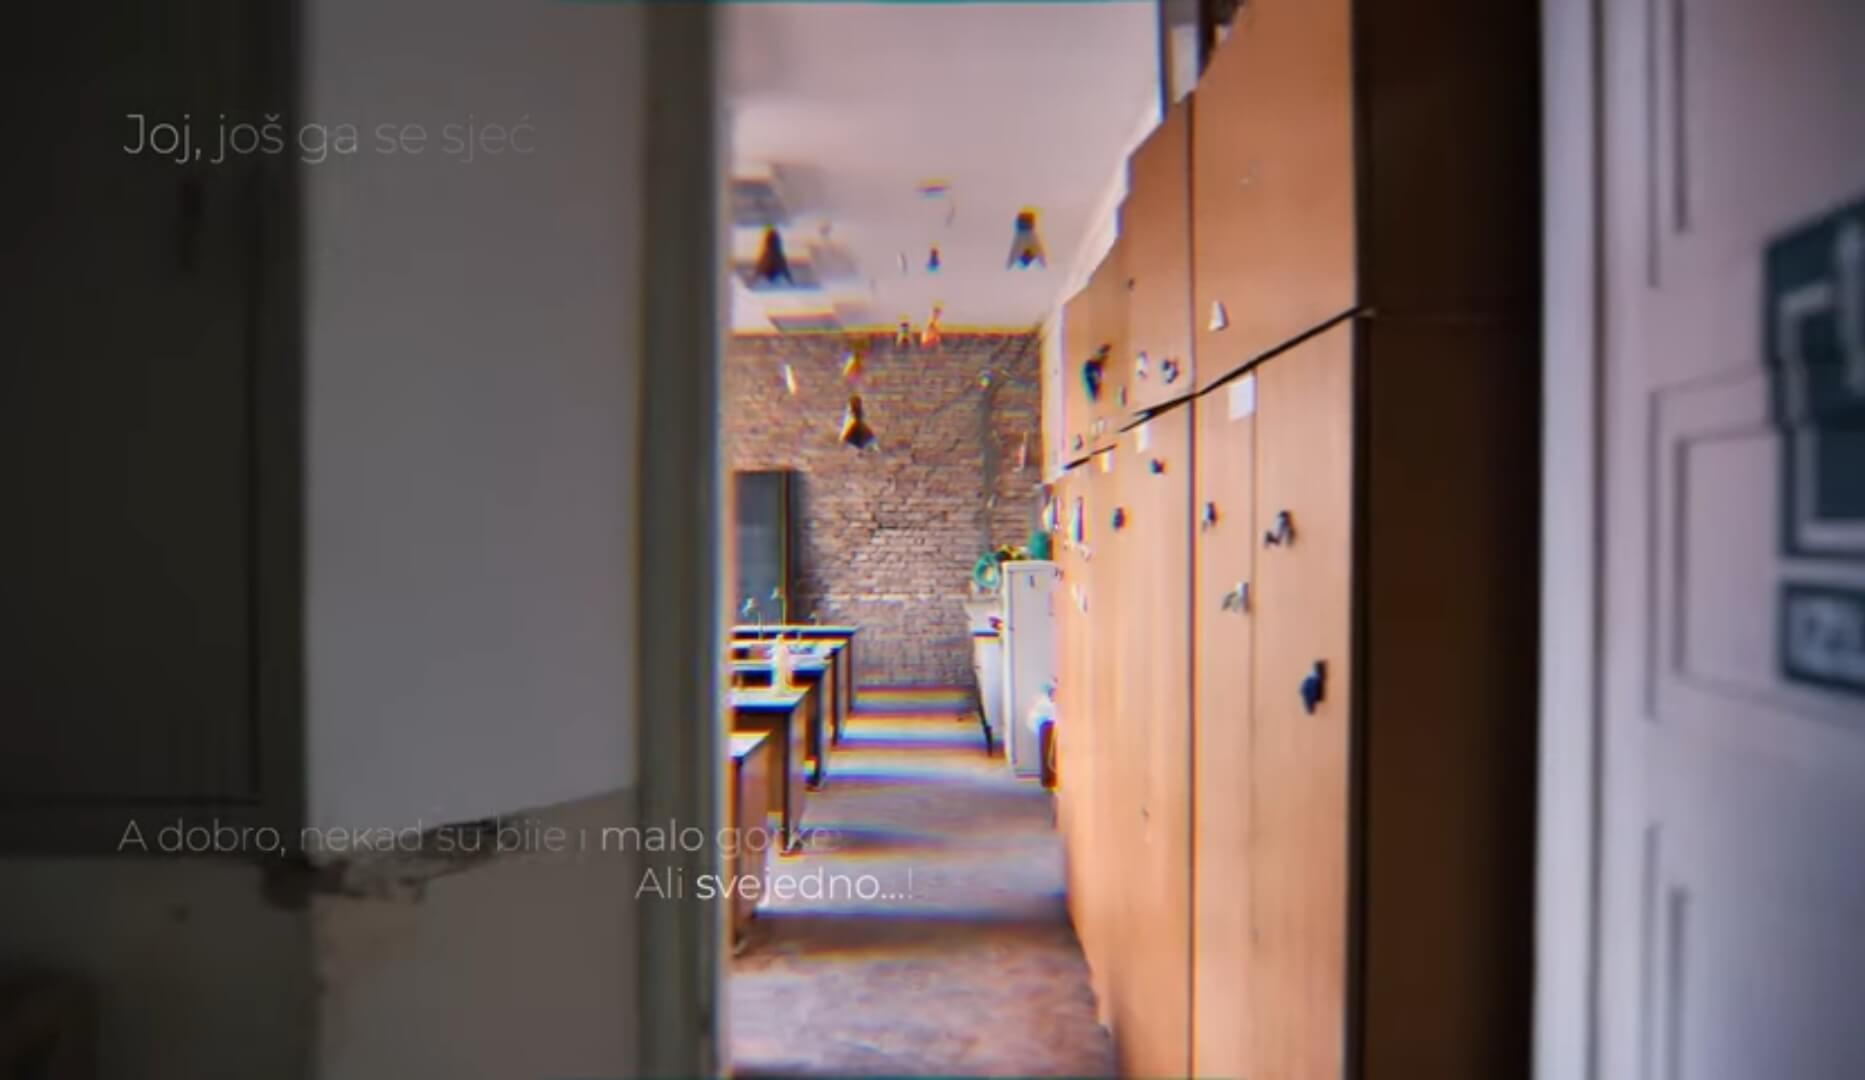 Zagrebački fakultet dirljivim videom poziva na pomoć nakon potresa